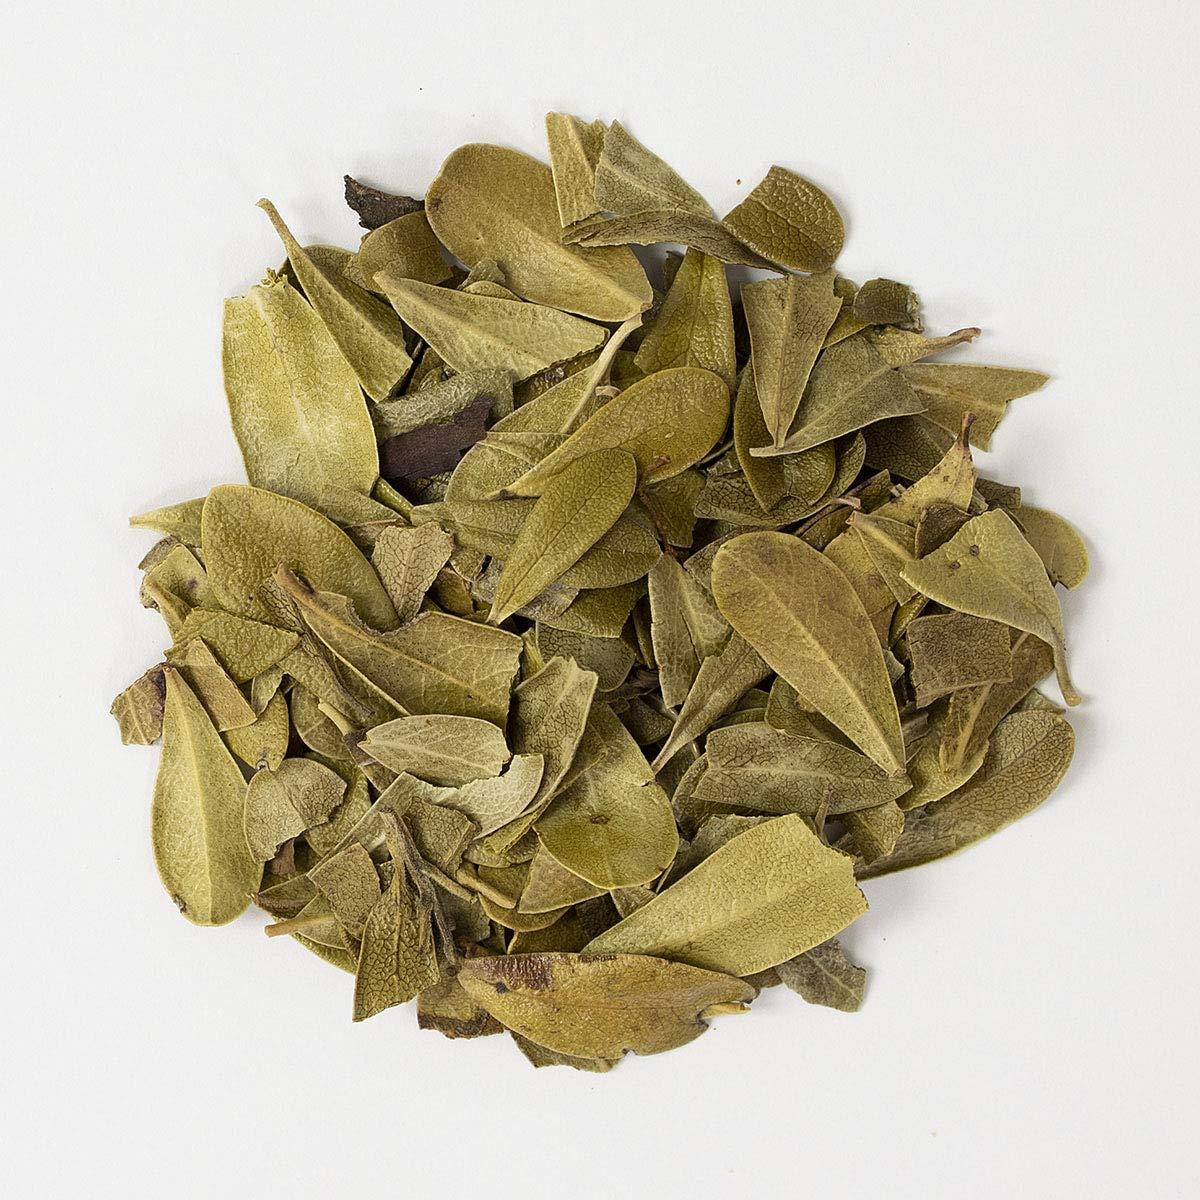 Frontier Co-op Uva Ursi Leaf Whole, Kosher, Non-irradiated | 1 lb. Bulk Bag | Arctostaphylos uva-ursi (L.) Spreng.